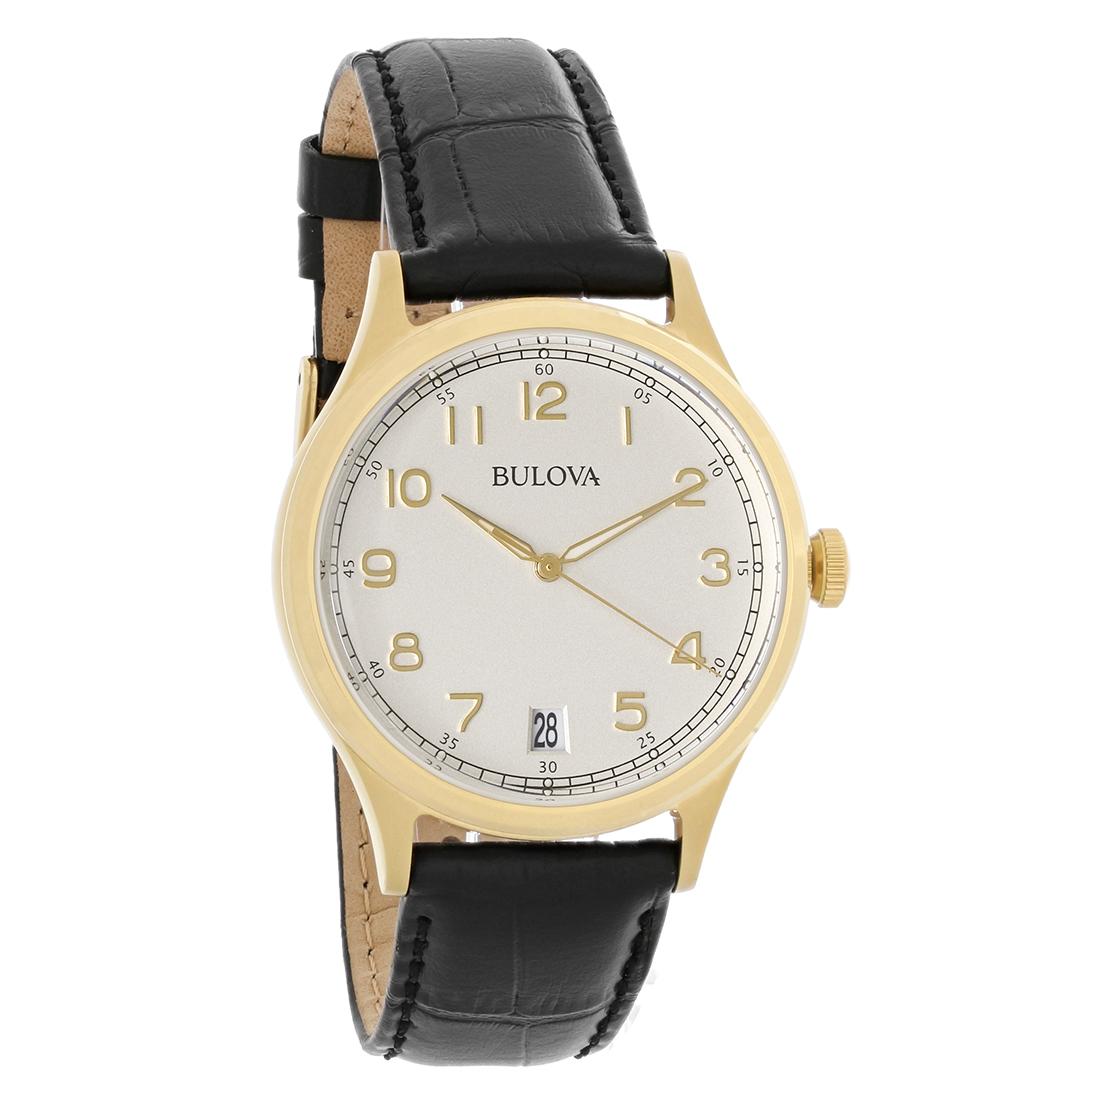 Bulova classic mens gold black leather strap quartz watch 97b147 ebay for Black leather strap men